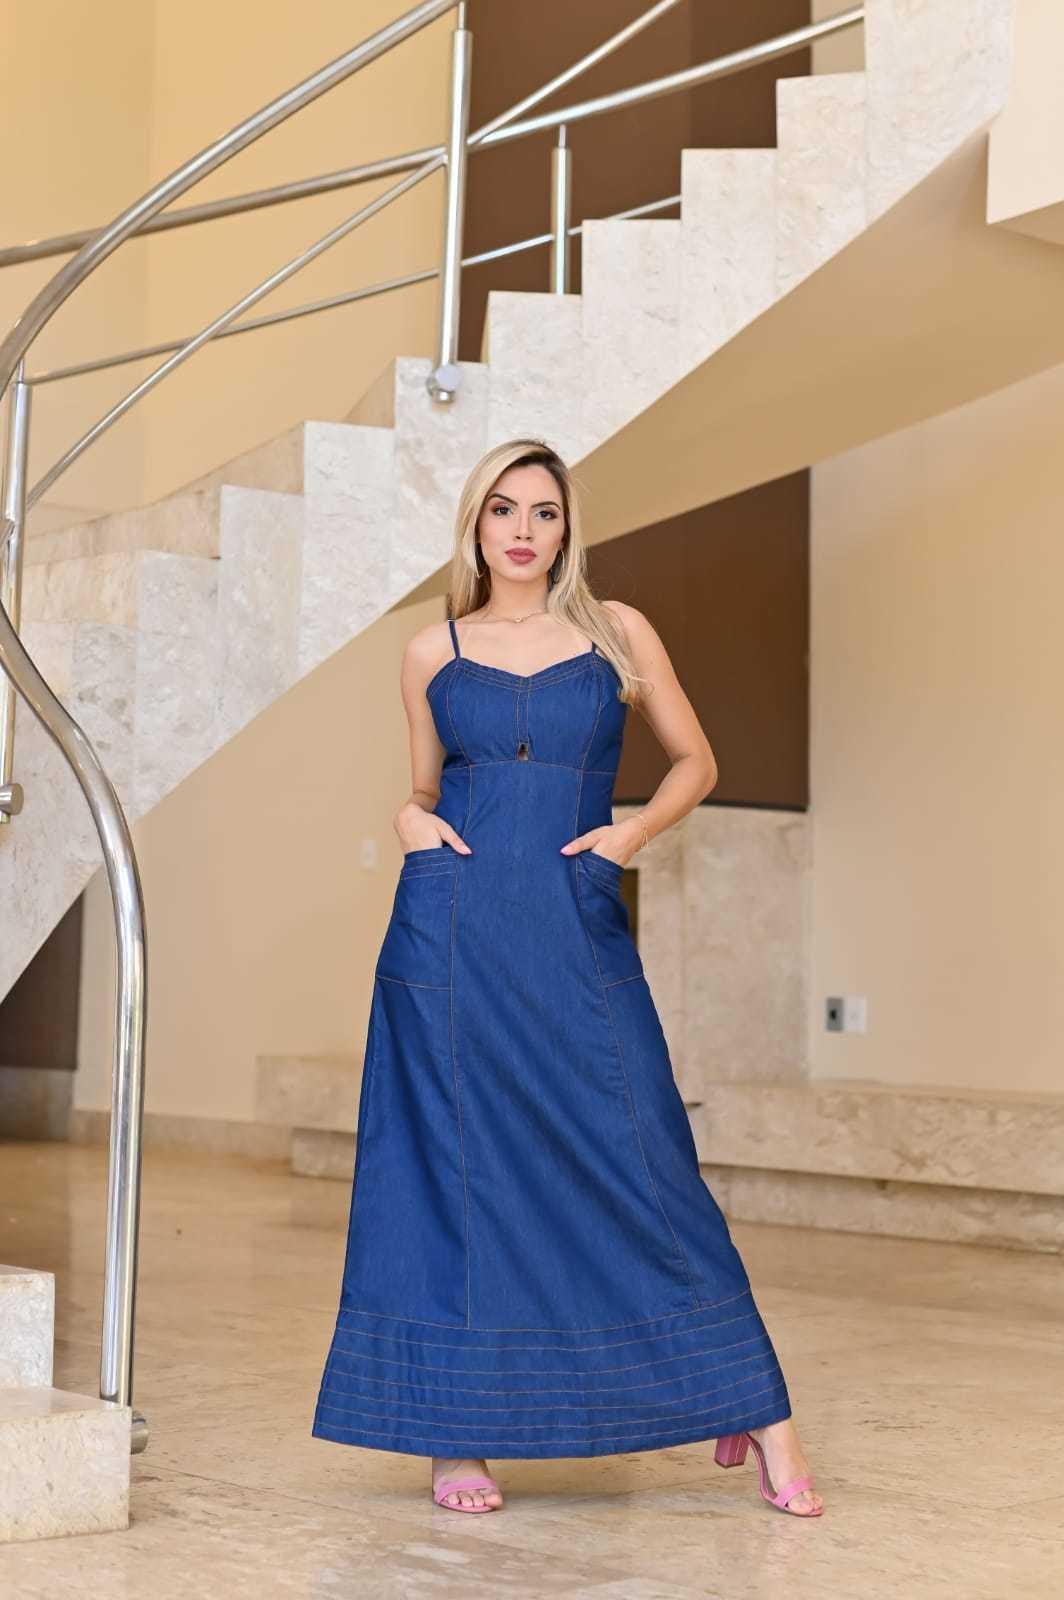 Vestido Longo Jeans Escuro Recorte Vazado e Costura Prespontada Omni Vinci